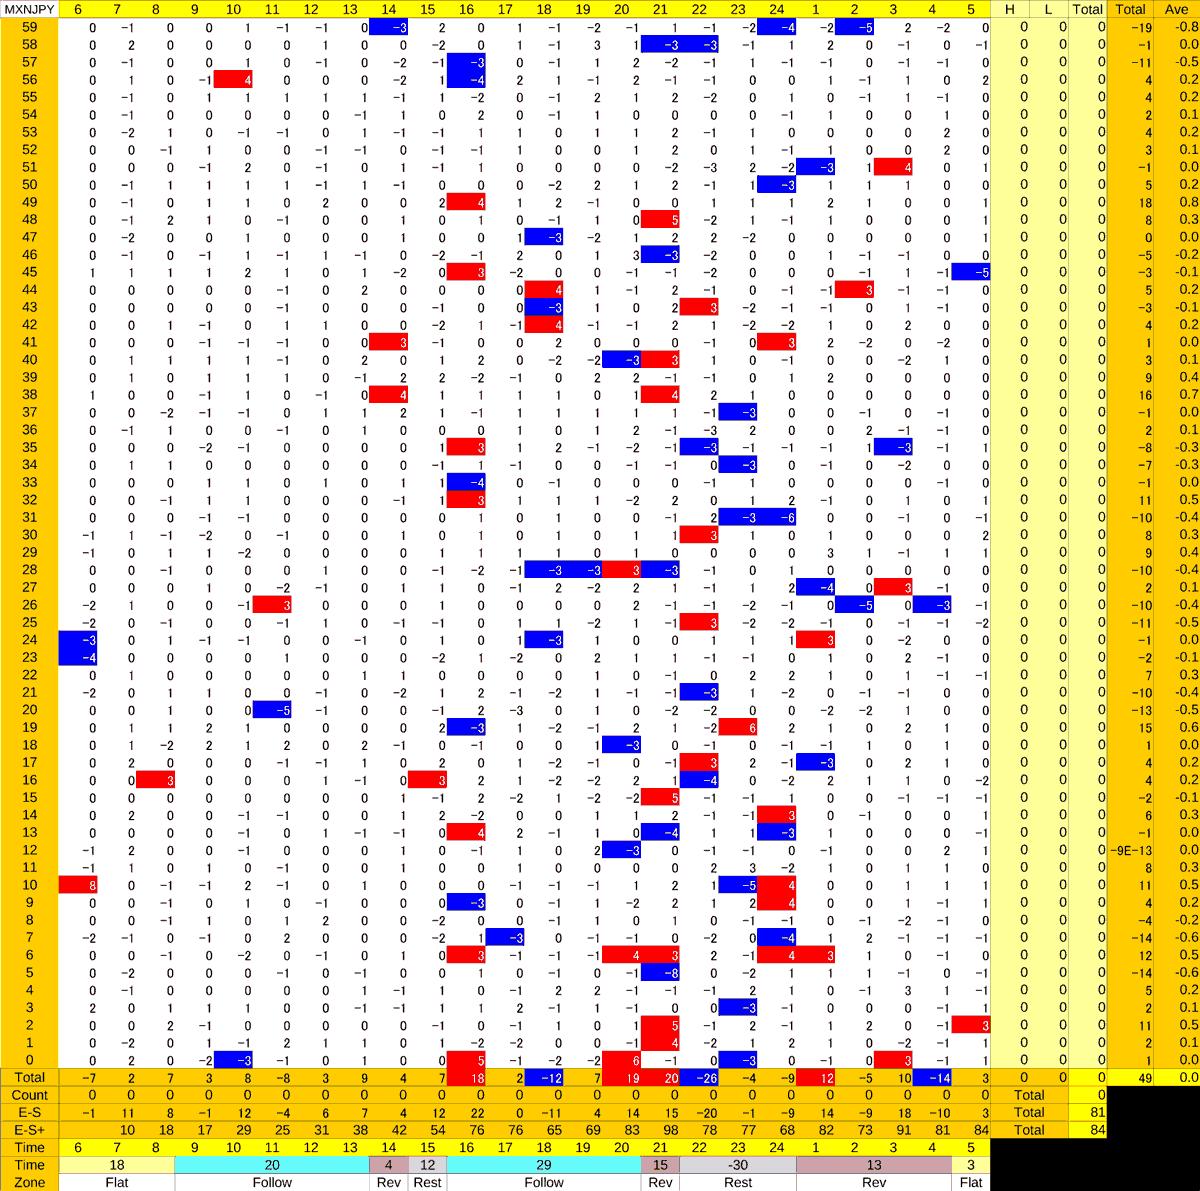 20201007_HS(3)MXNJPY